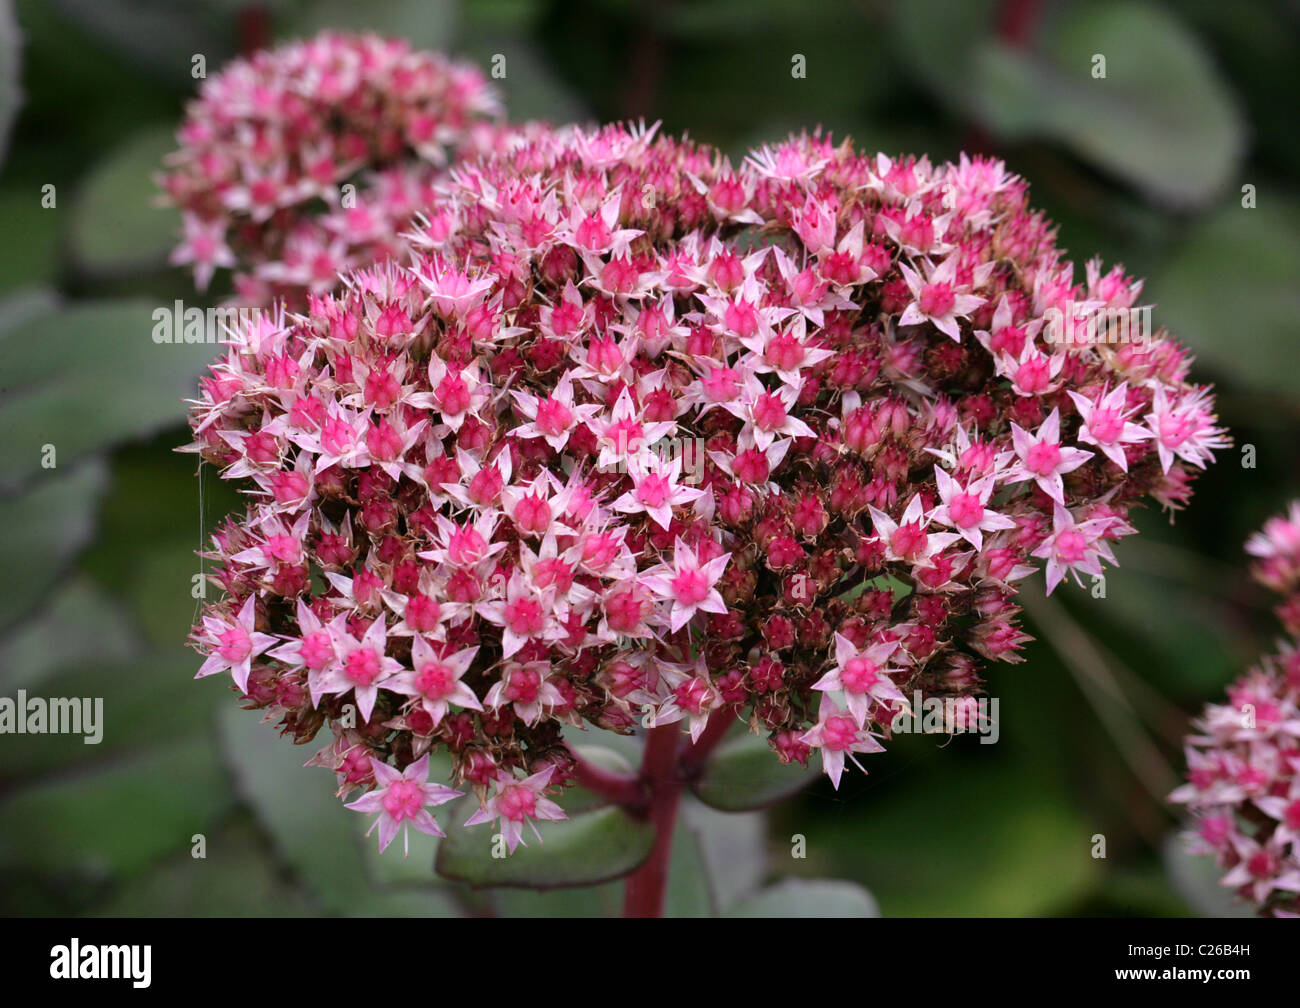 Matrona Showy Stonecrop or Matrona Stonecrop, Telephium 'Matrona', Crassulaceae. A Pink Sedum Cultivar. - Stock Image